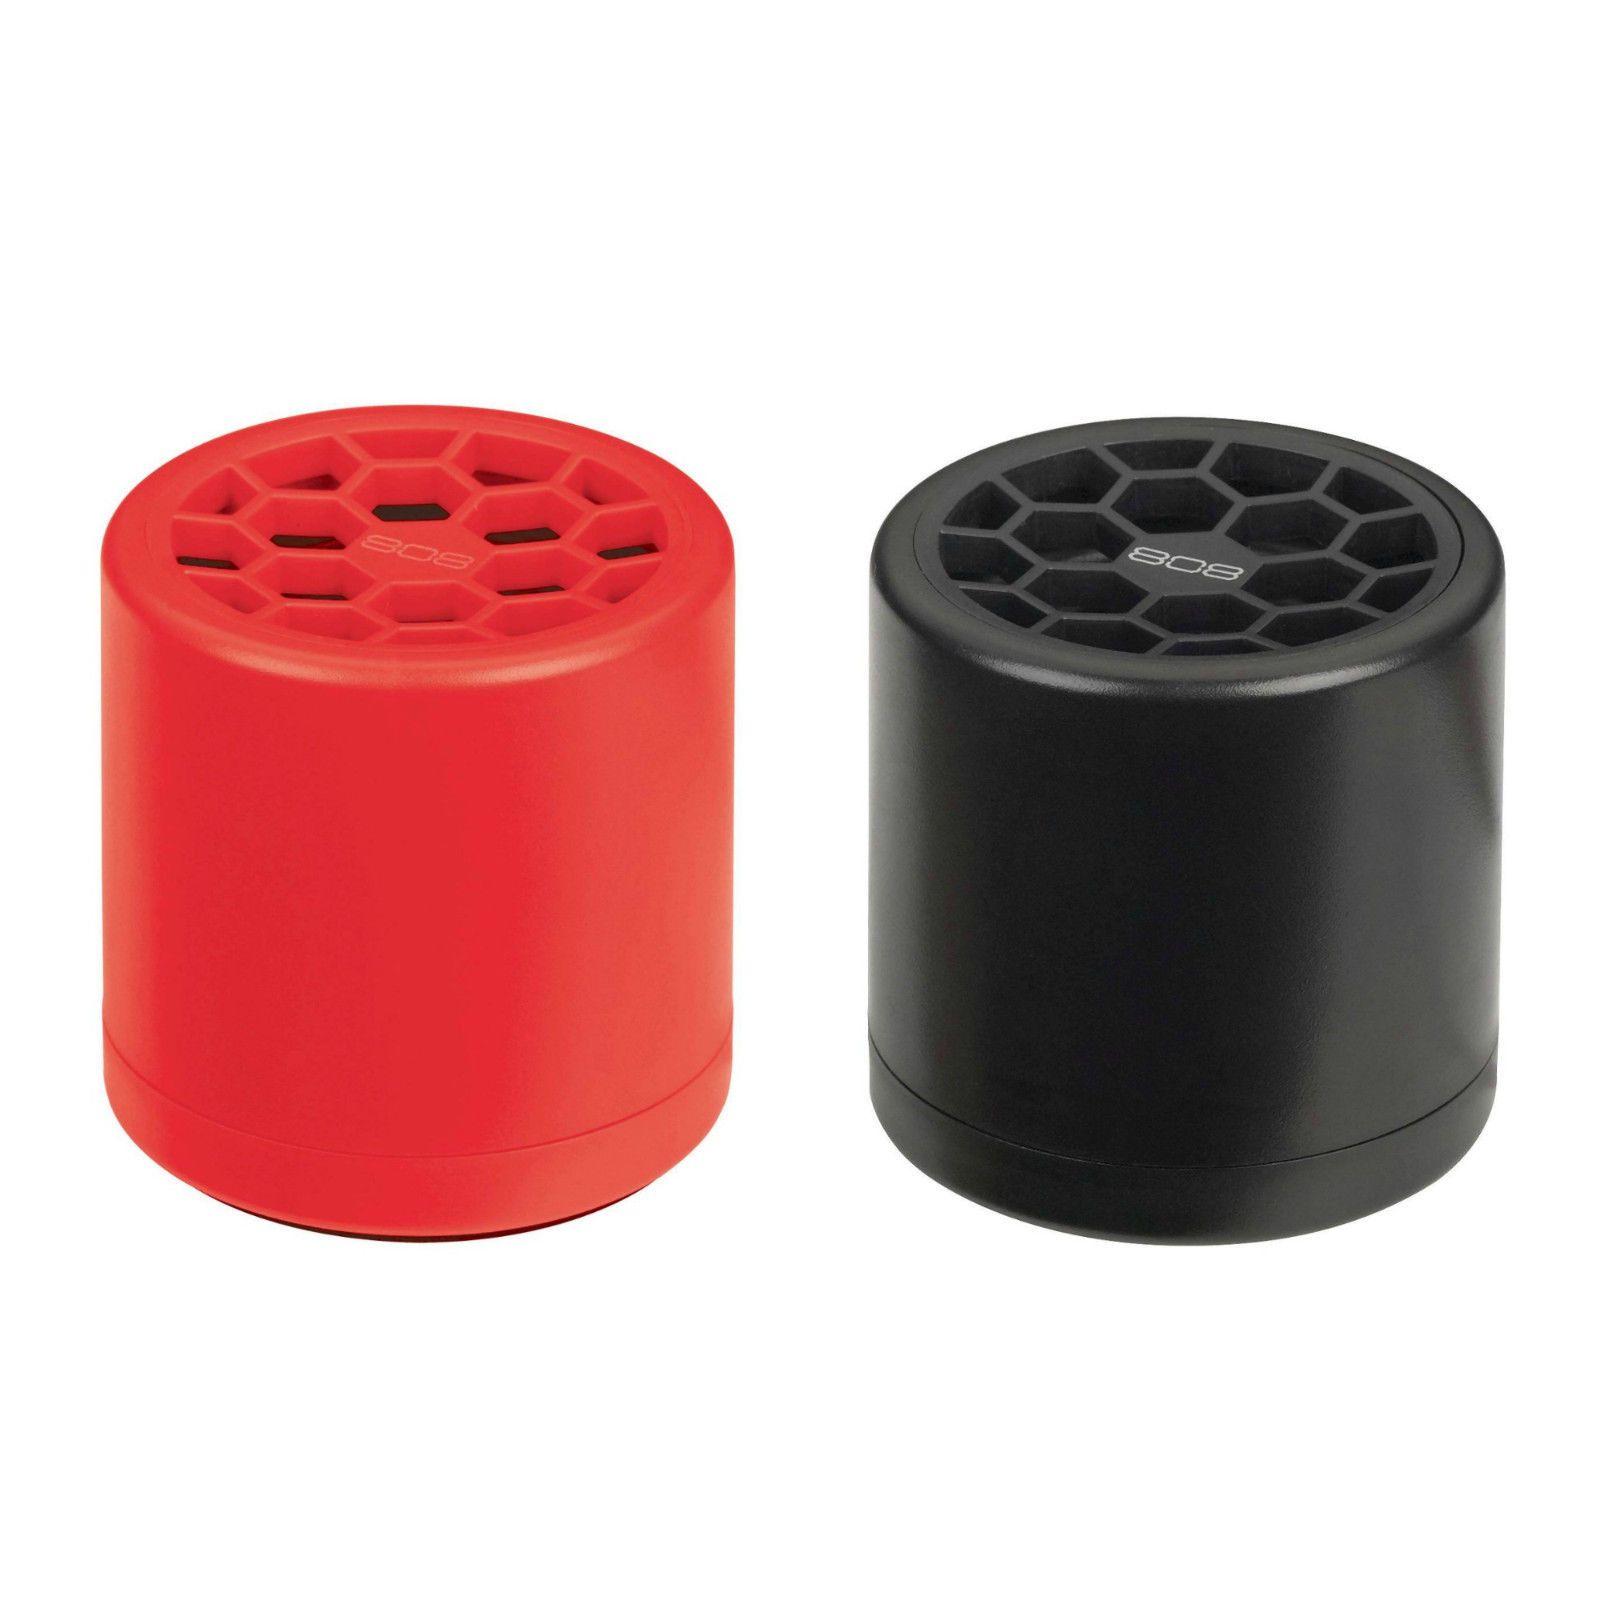 10 Thump Bluetooth Wireless Speaker Portable Convenient Black or